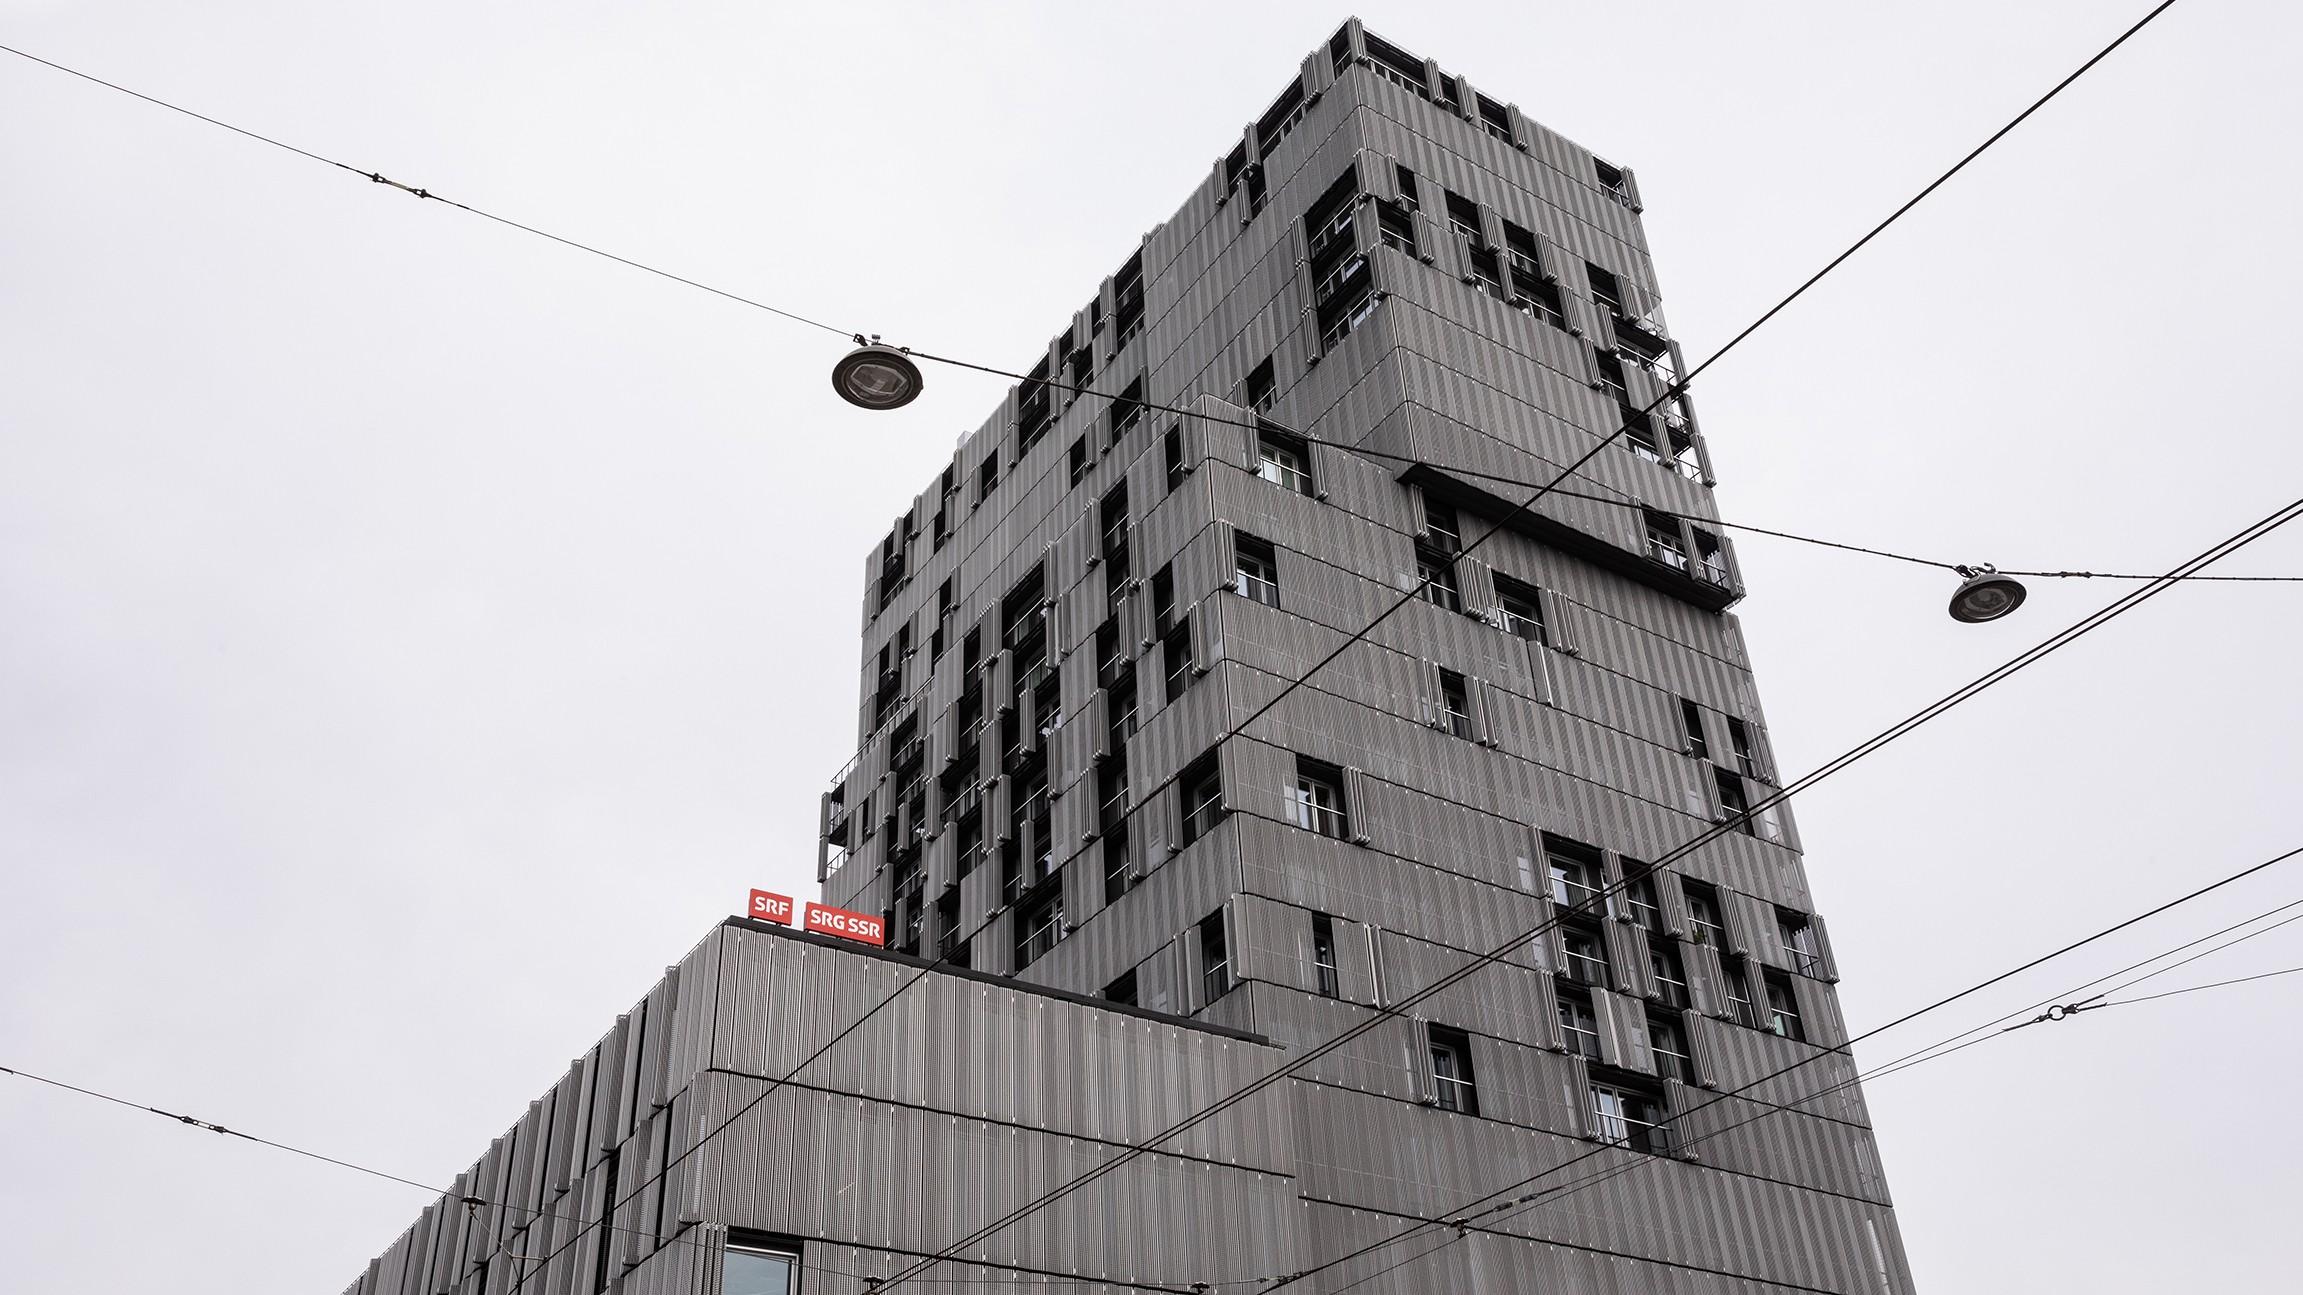 Meret Oppenheim Hochhaus Basel  SRF/Matthias Willi